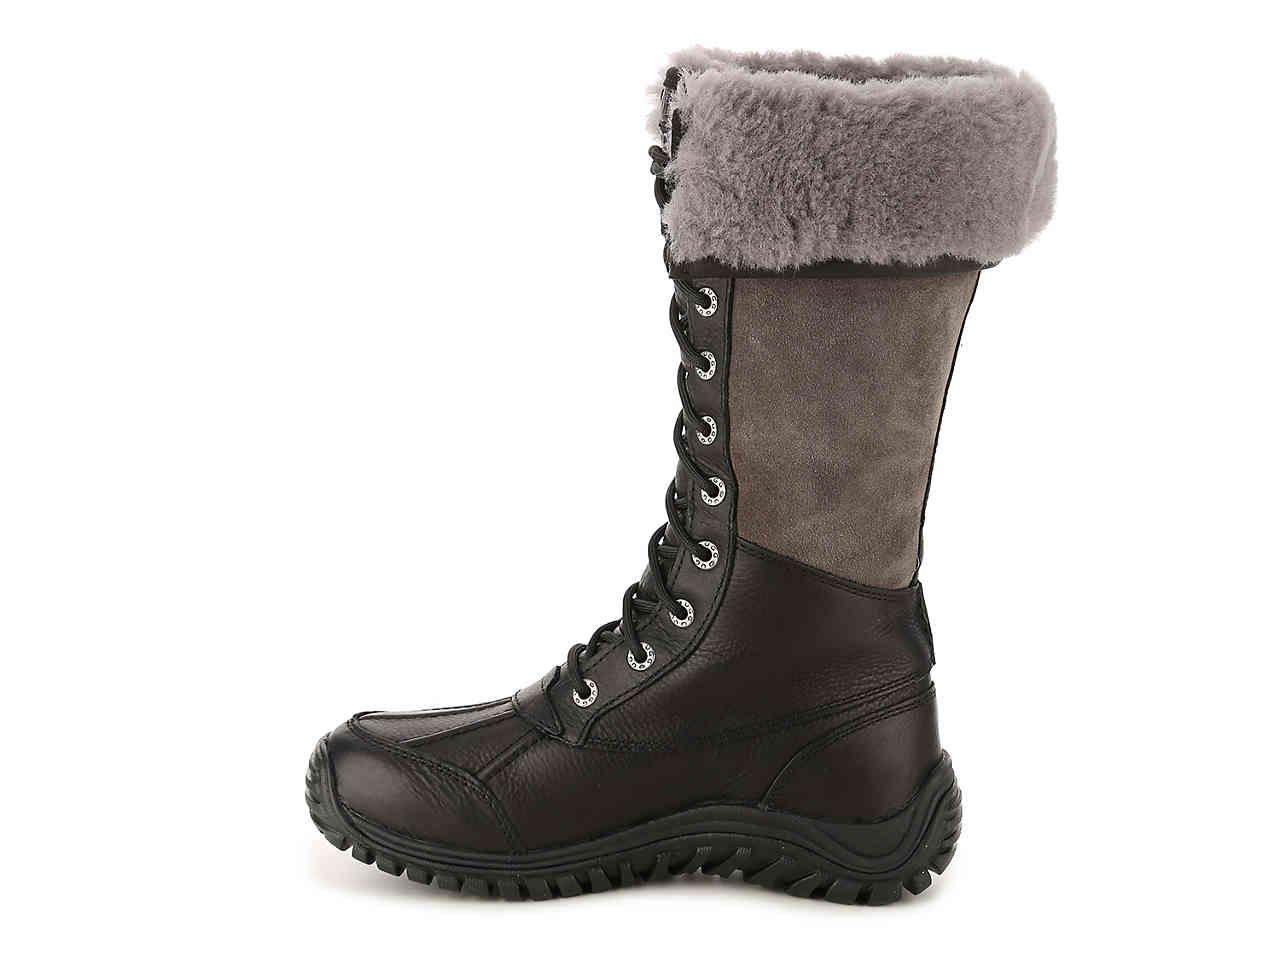 UGG Adirondack Snow Boot | Boots, Snow